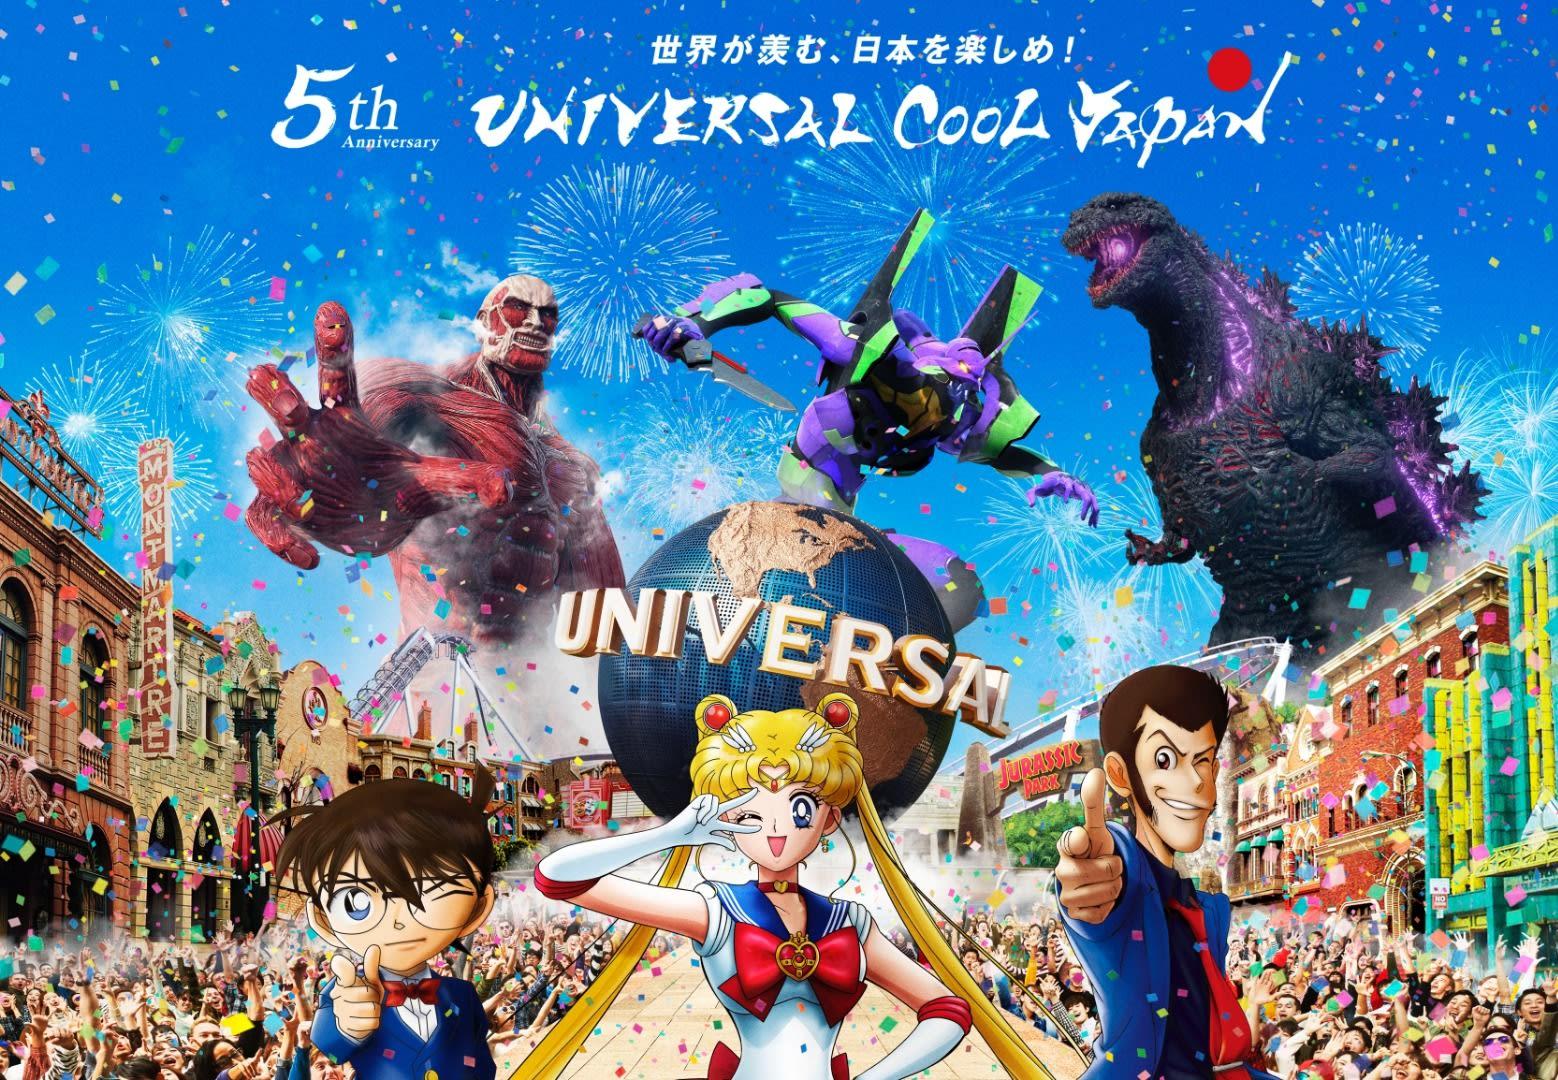 2019日本環球影城UniversalCoolJapan2019